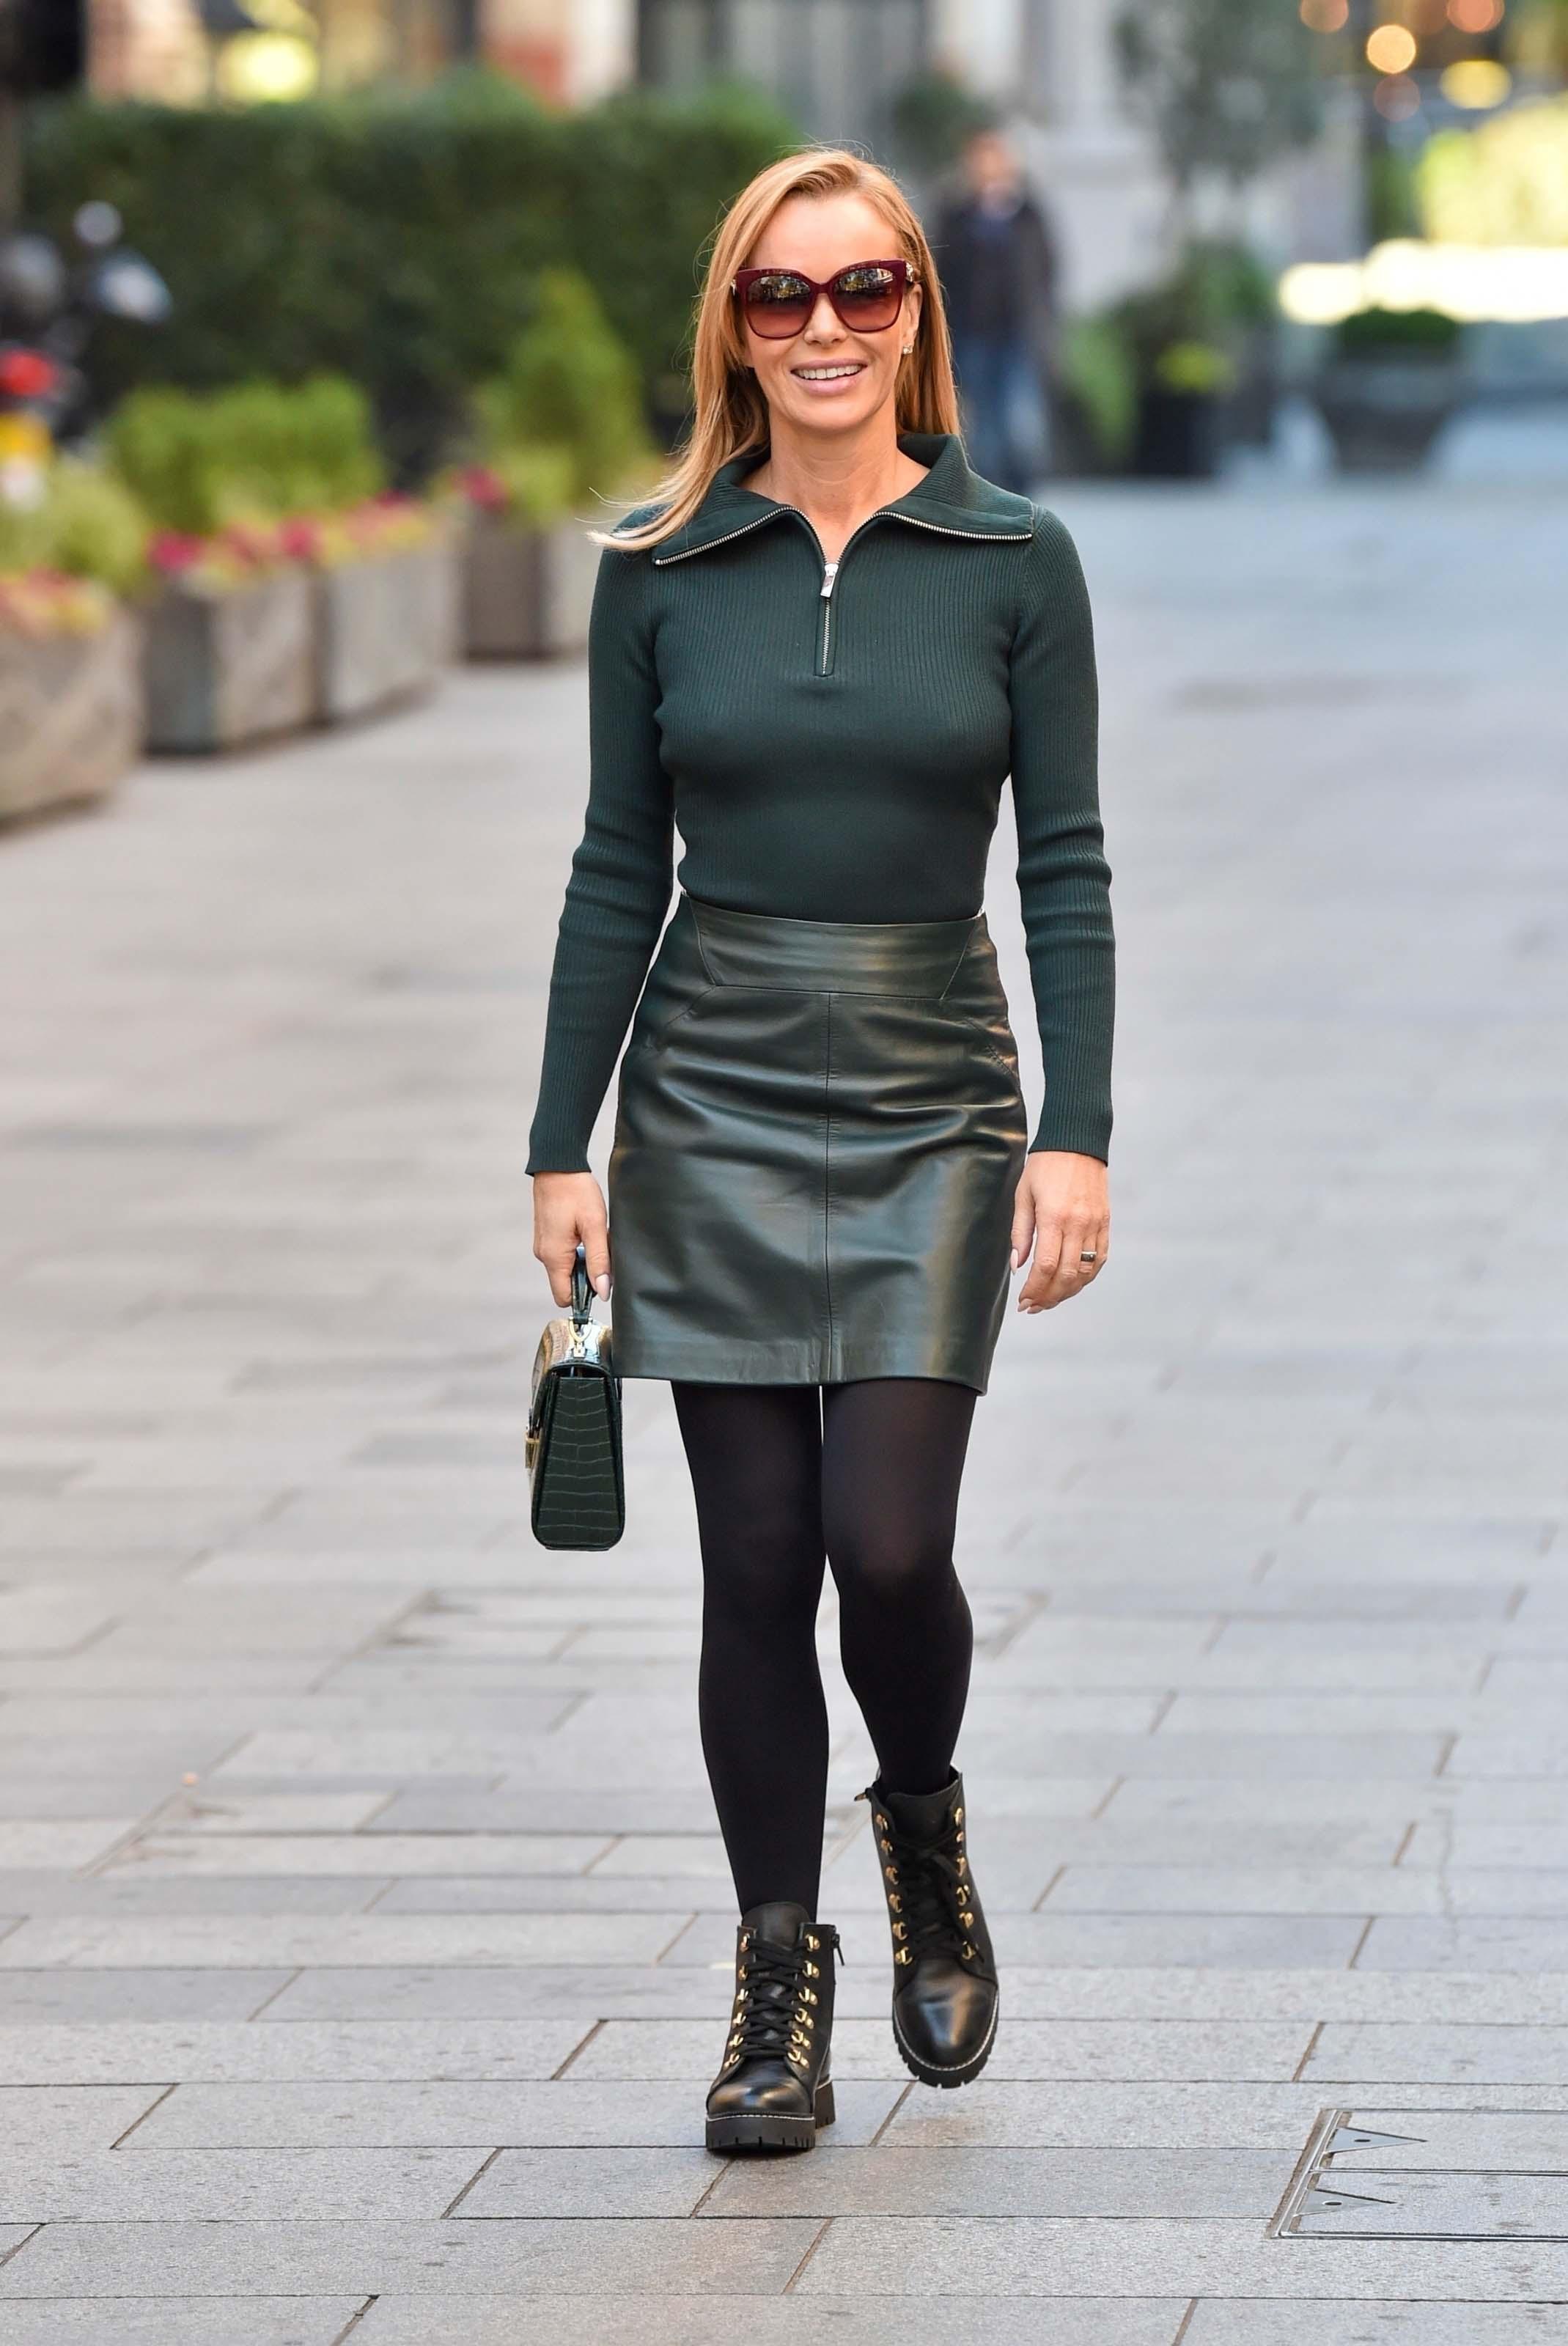 Amanda Holden leaving the Global studios in London